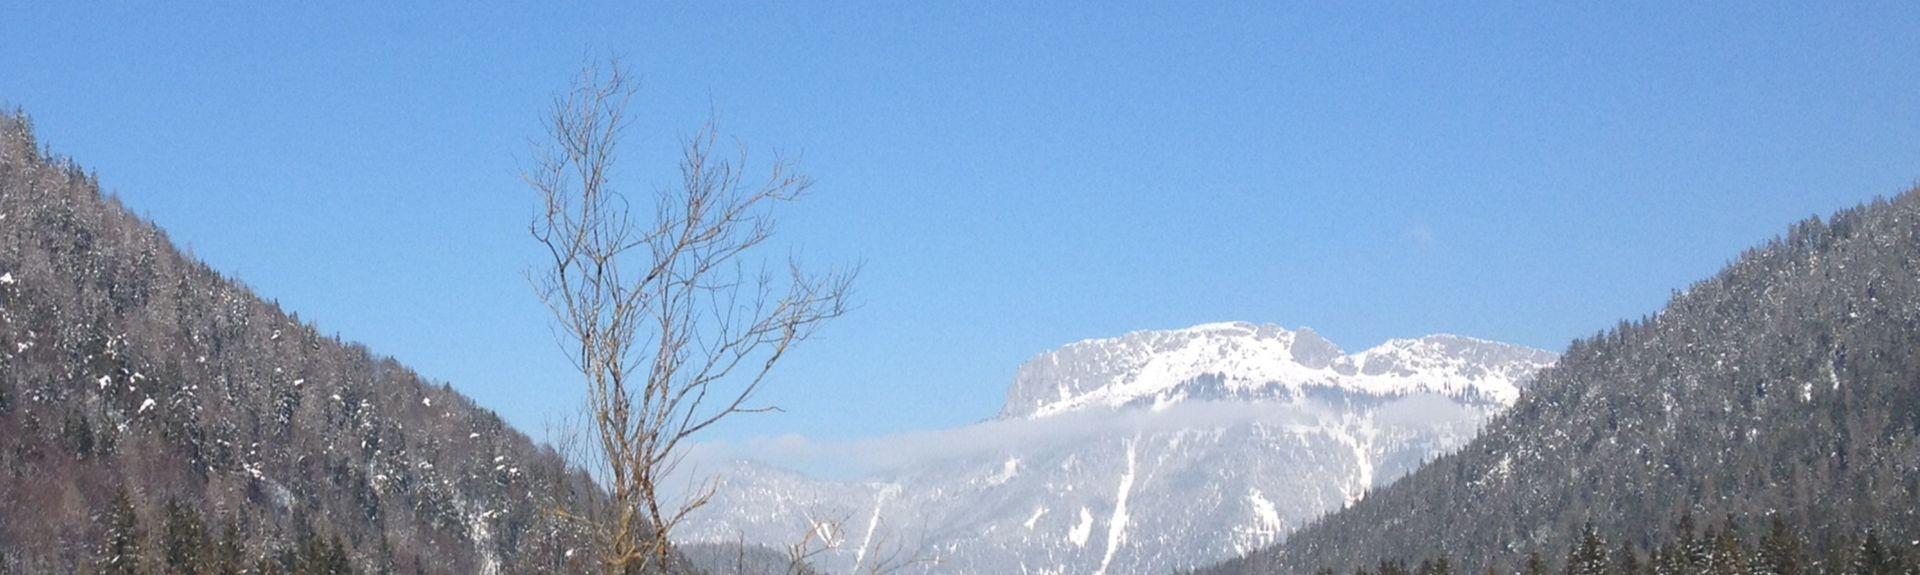 Fieberbrunn, Tirol, Österreich